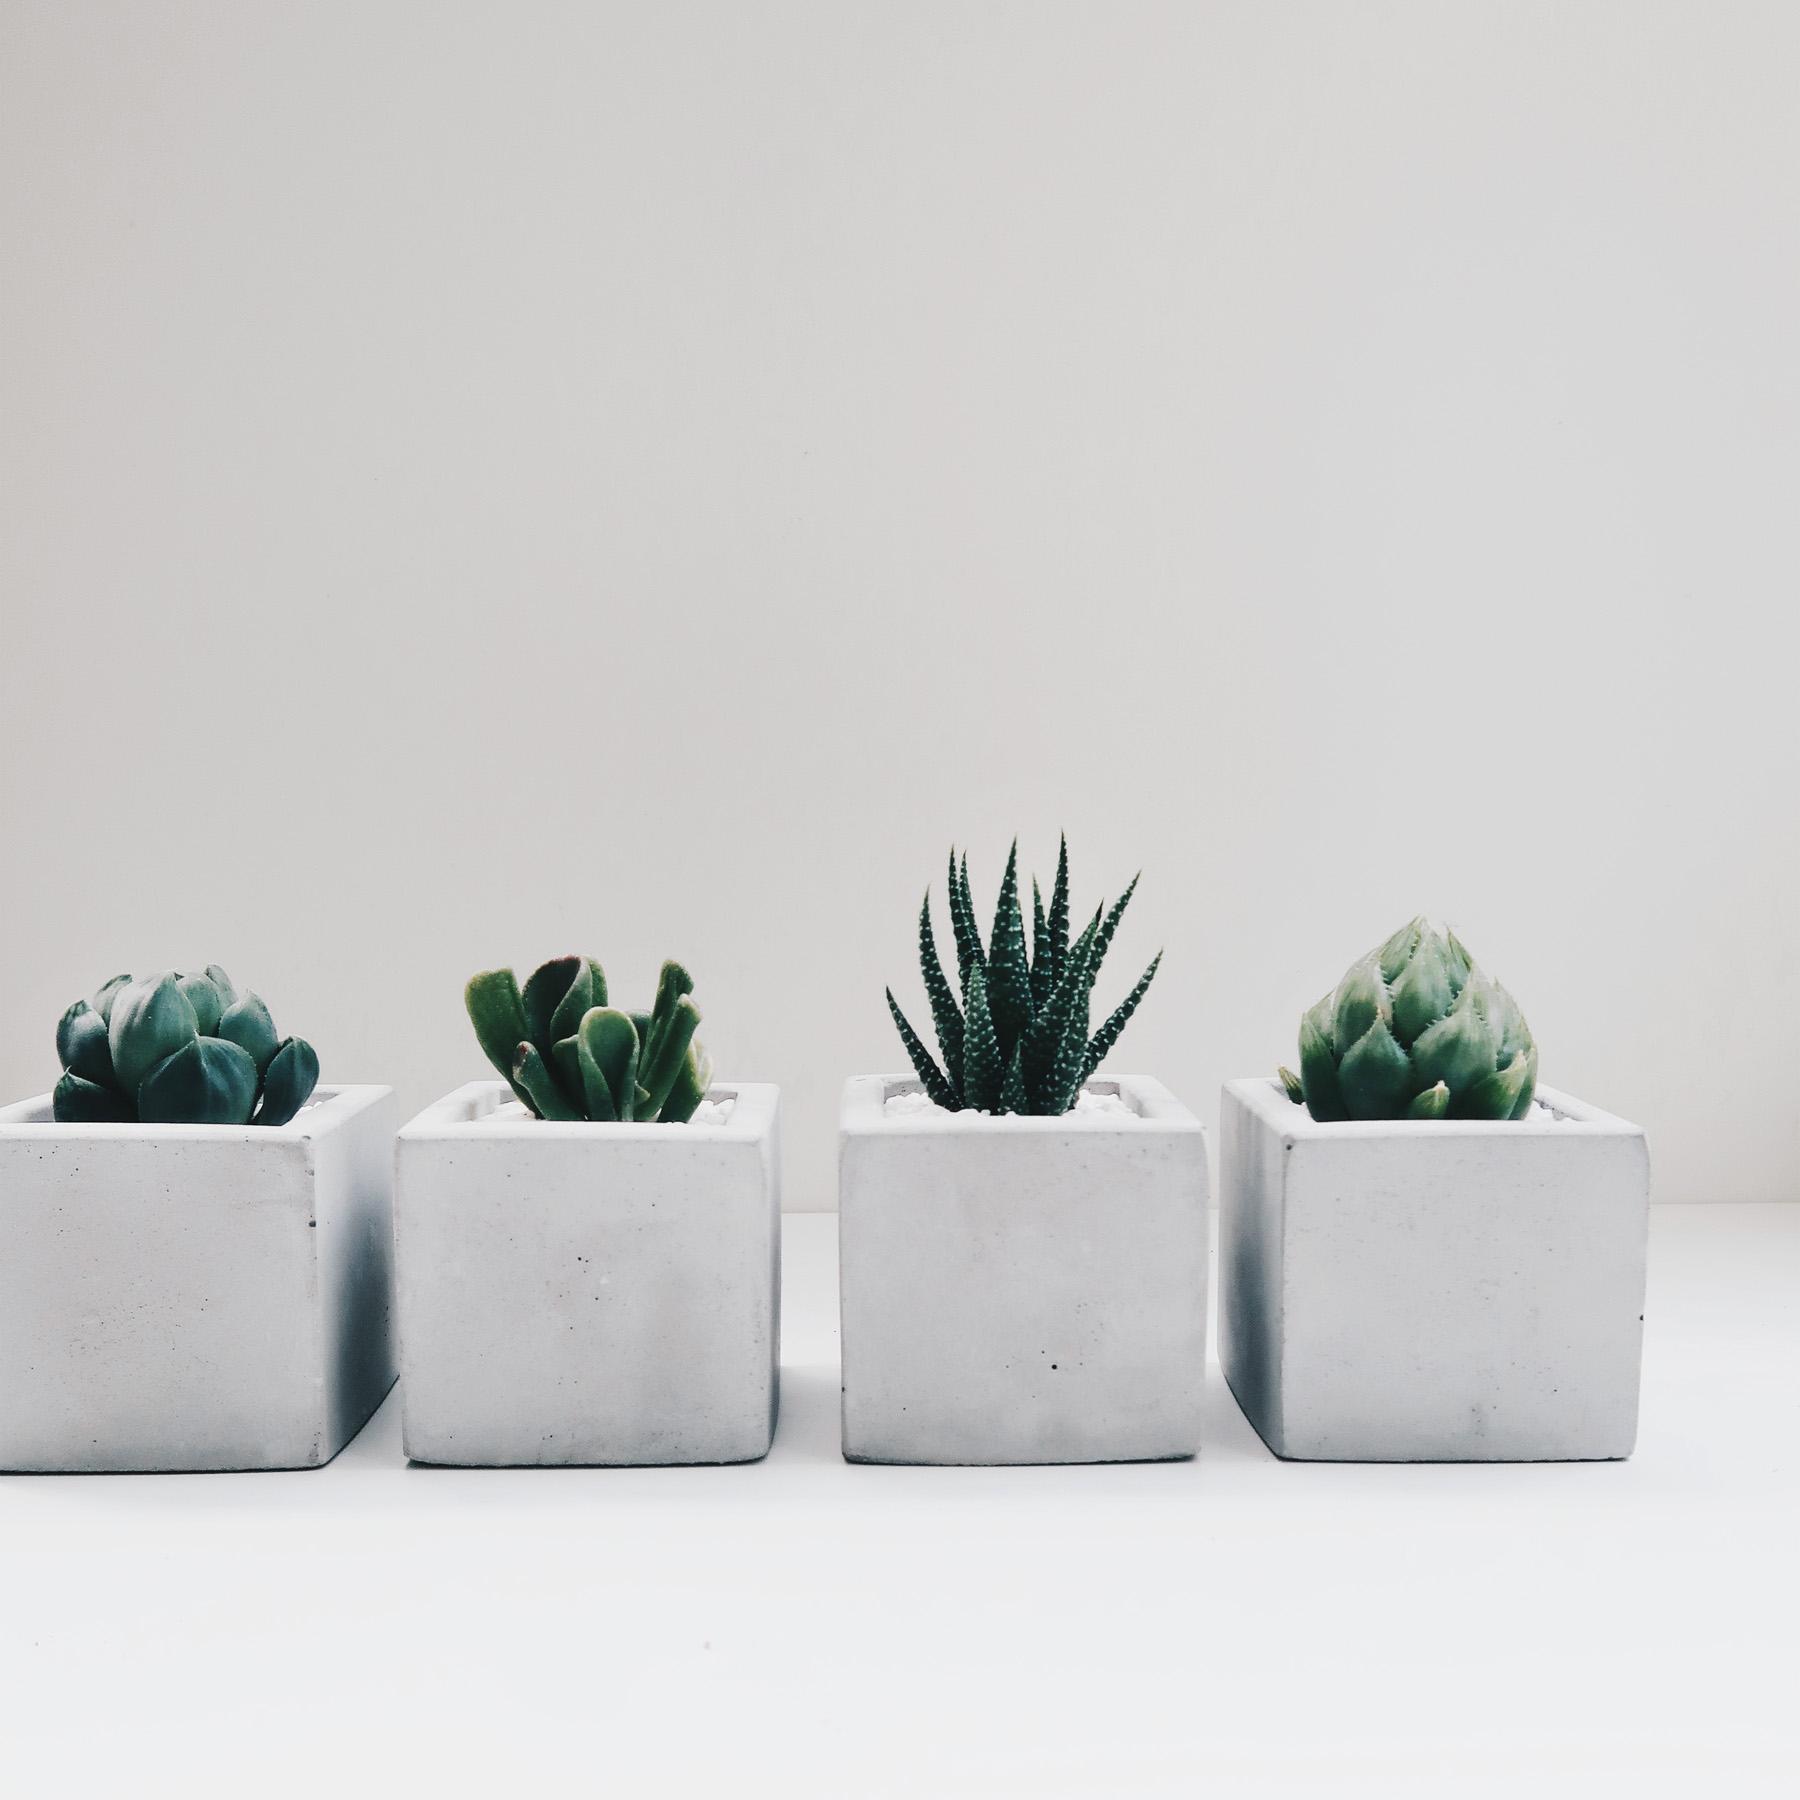 SINGLE HOUSE 單身公寓極簡方形多肉水泥盆栽 / Succulent Concrete planter